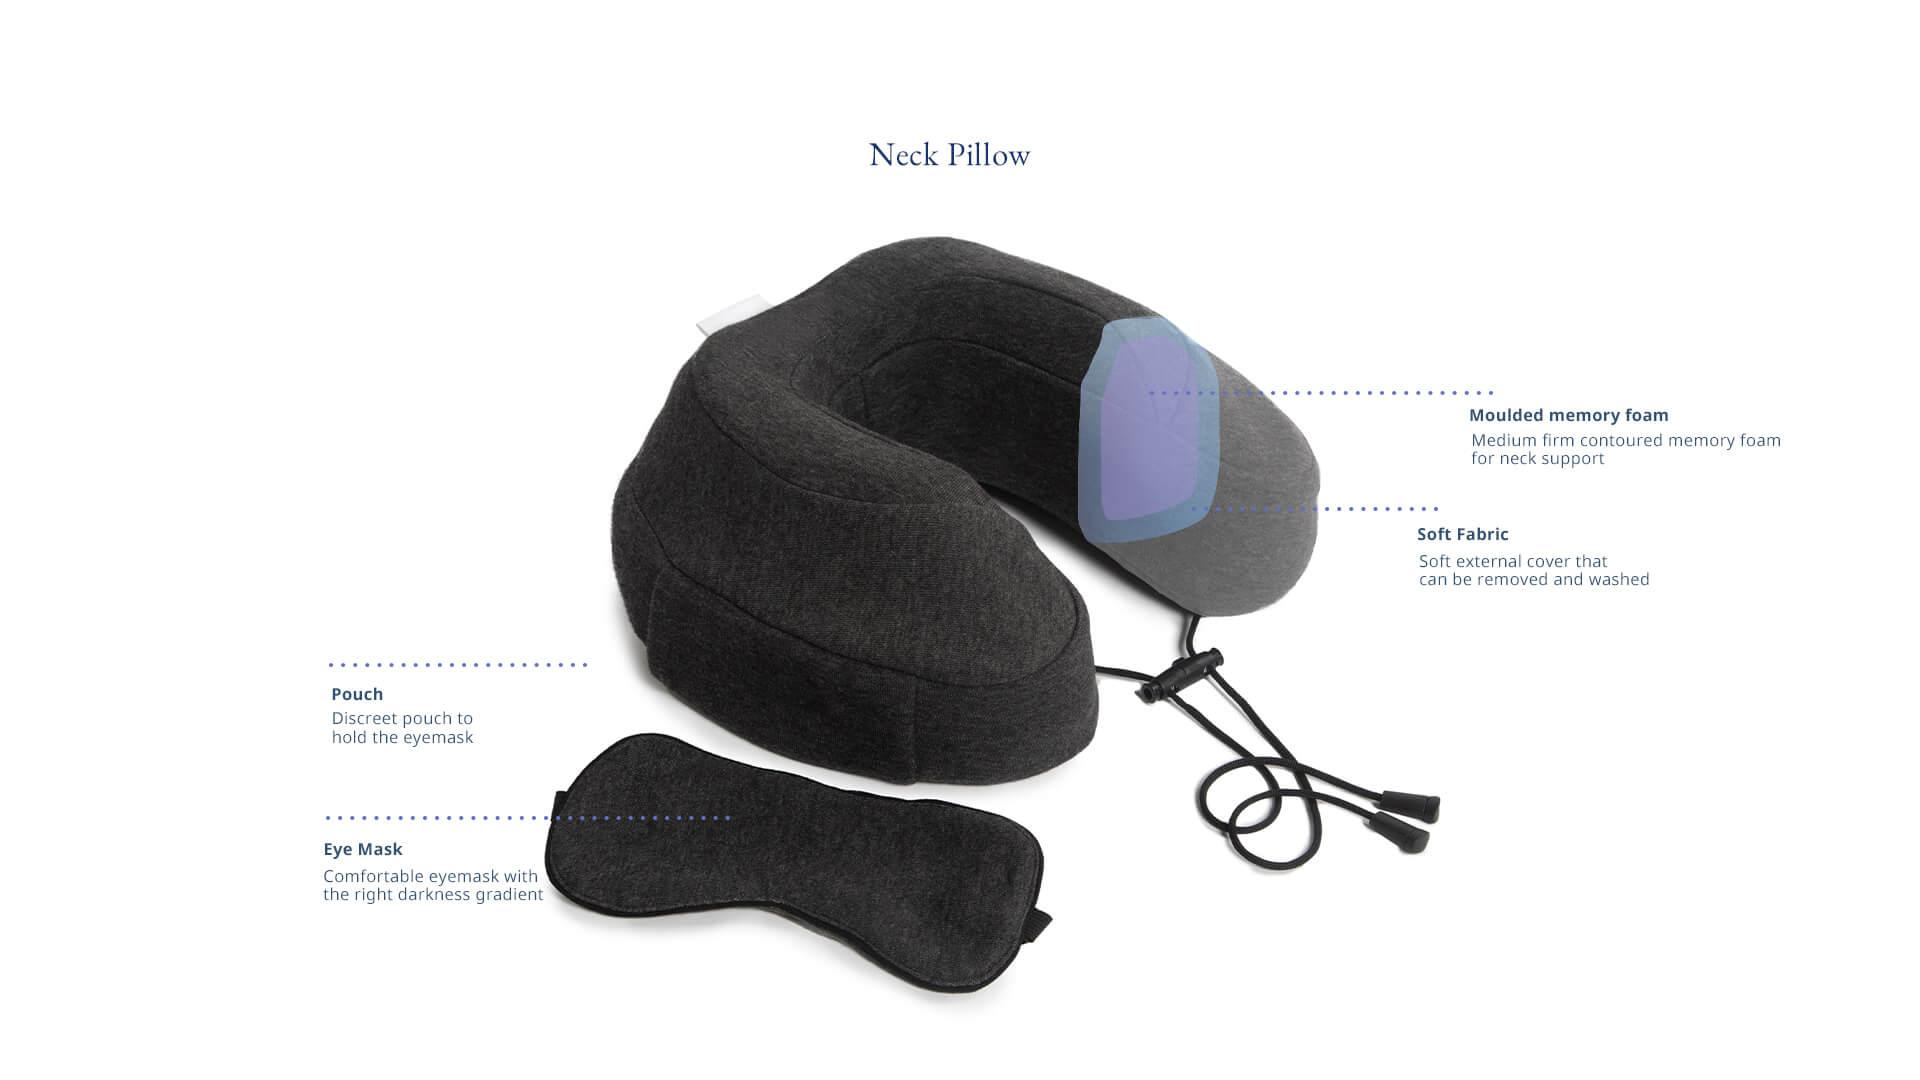 The Pillow Design